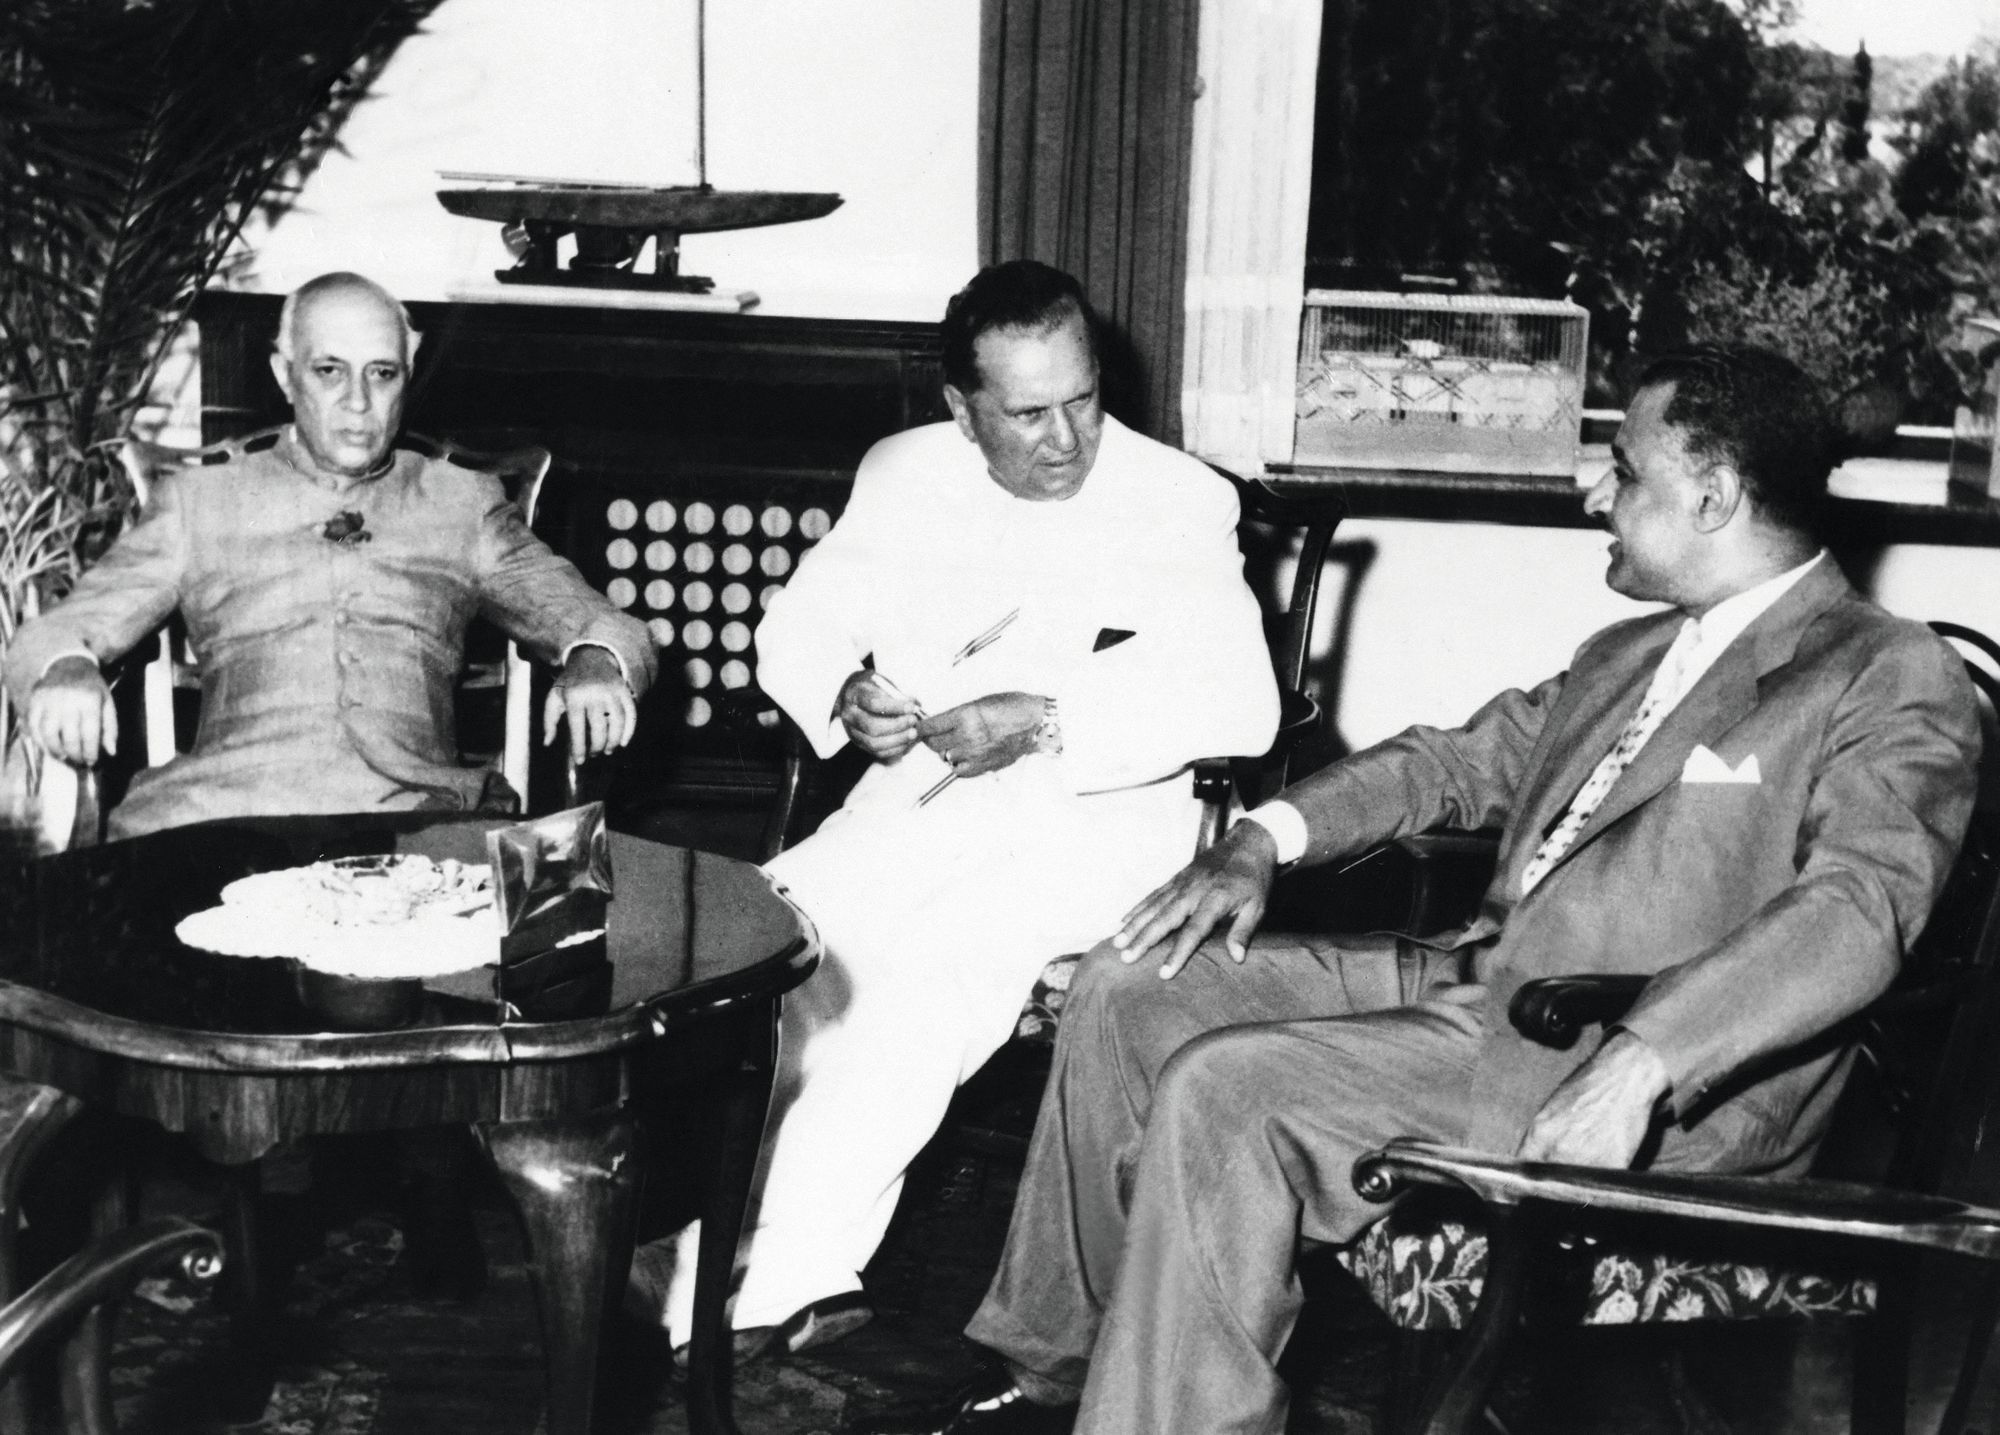 Anonyme, Nehru, Tito et Nasser lors d'une conférence 8 juillet 1956, photographie.